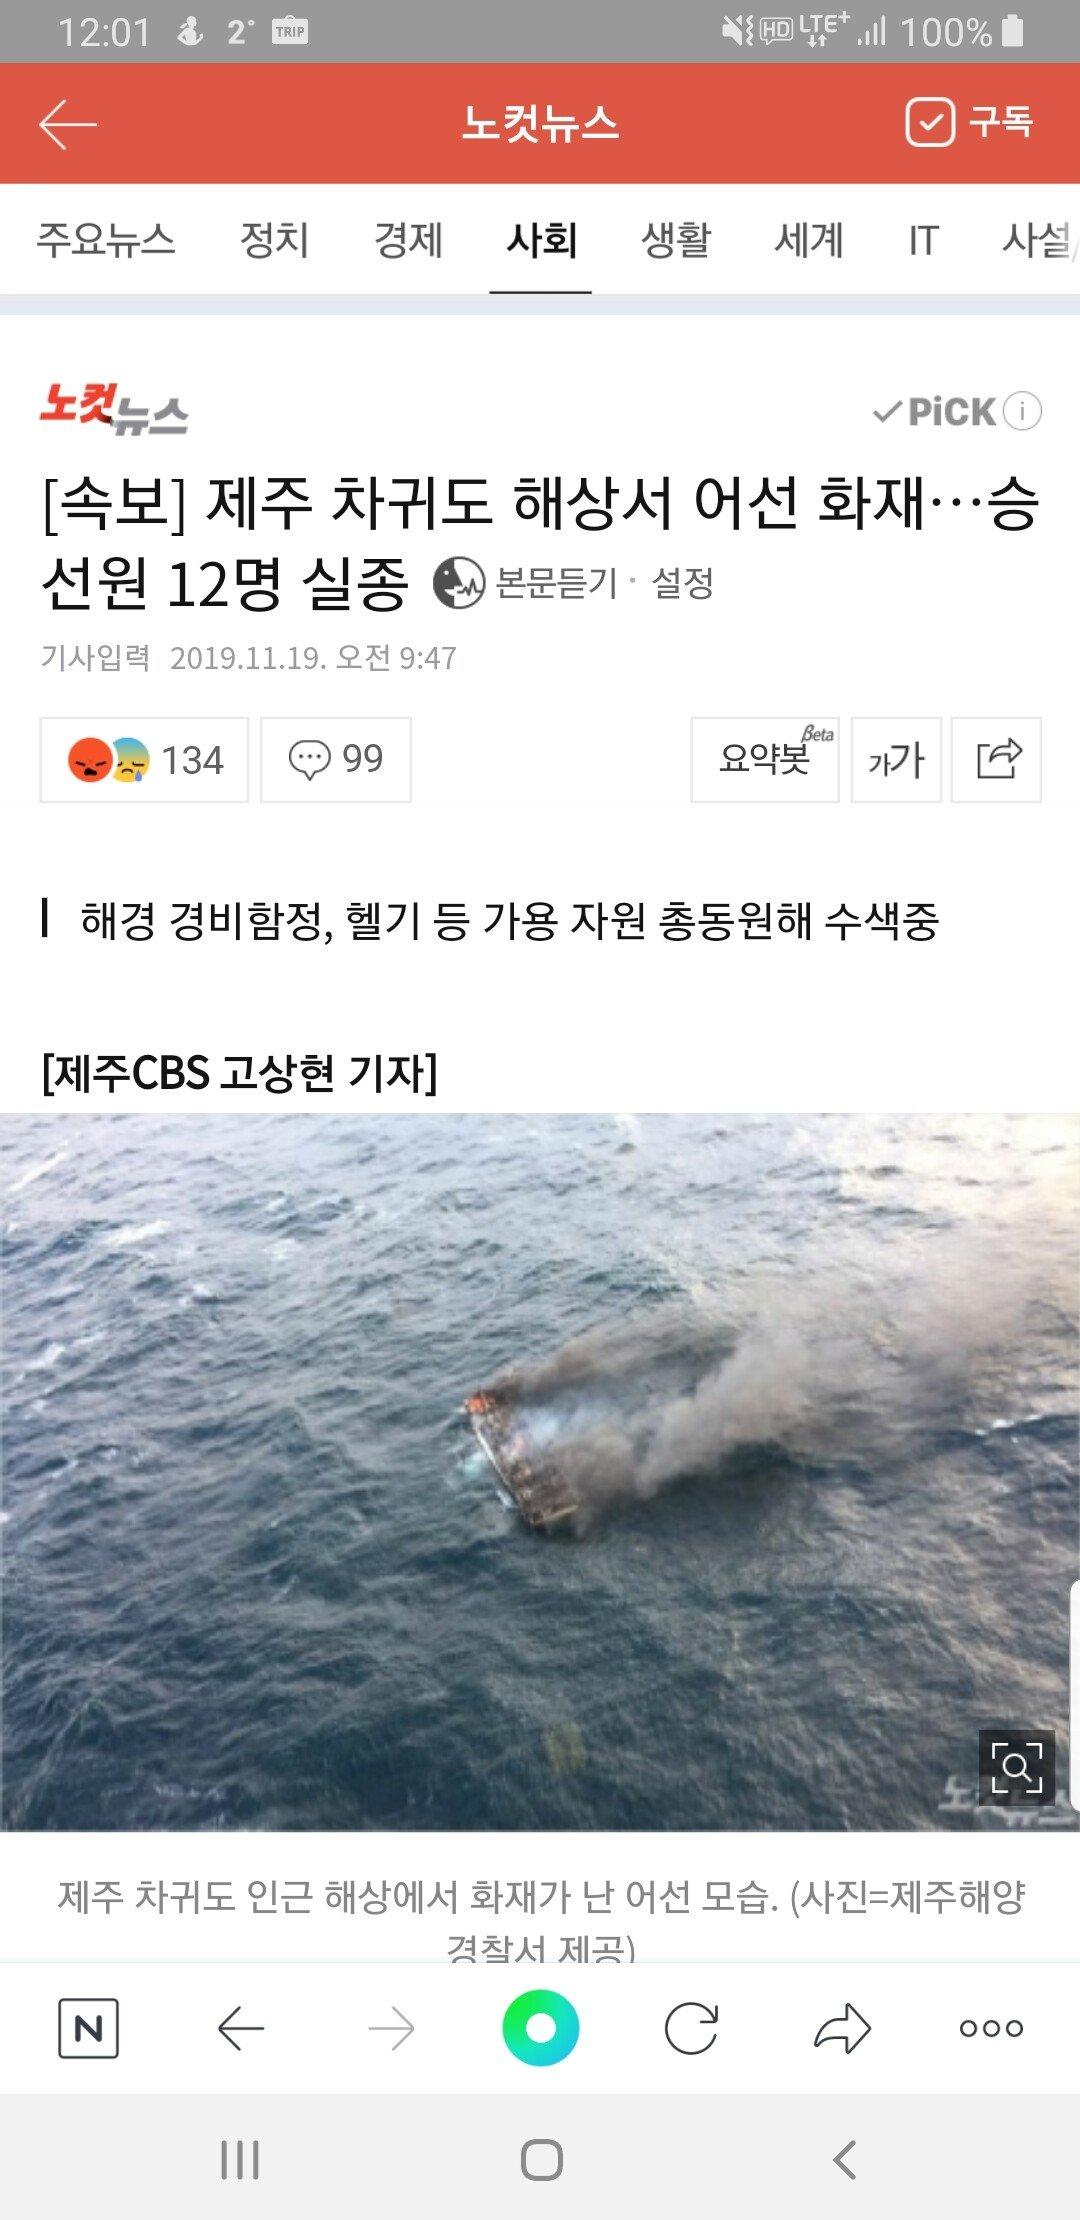 Screenshot_20191119-120148_NAVER.jpg 제주 차귀도 해상에서 선박화재 11명 실종